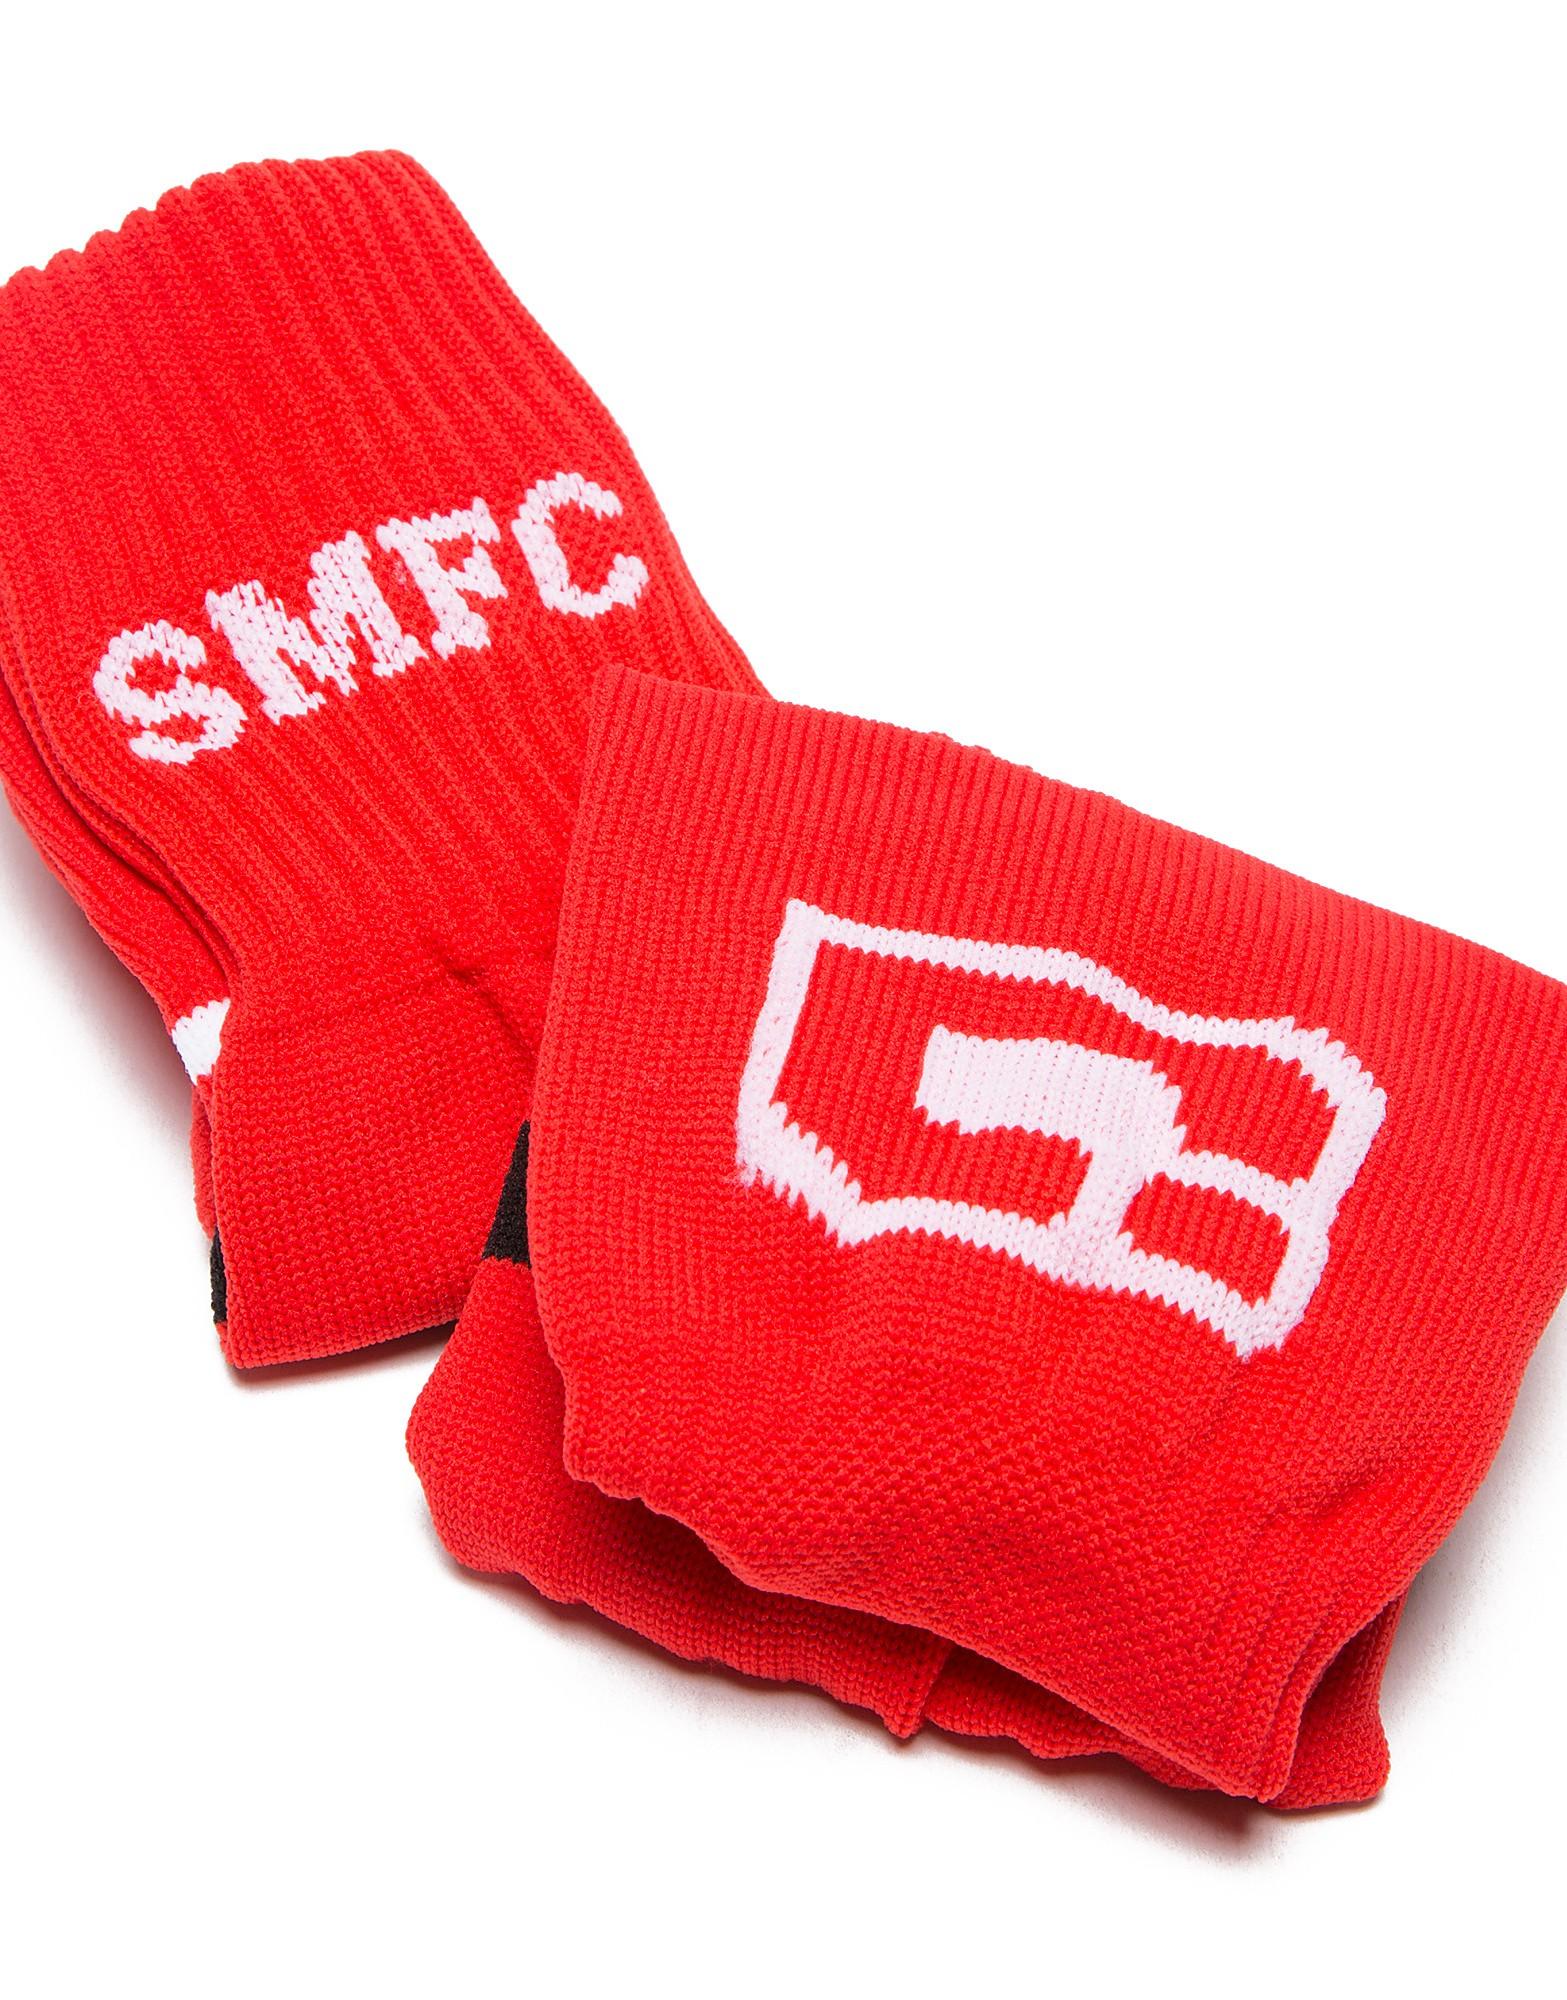 Carbrini St Mirren 2015 Away Socks Junior